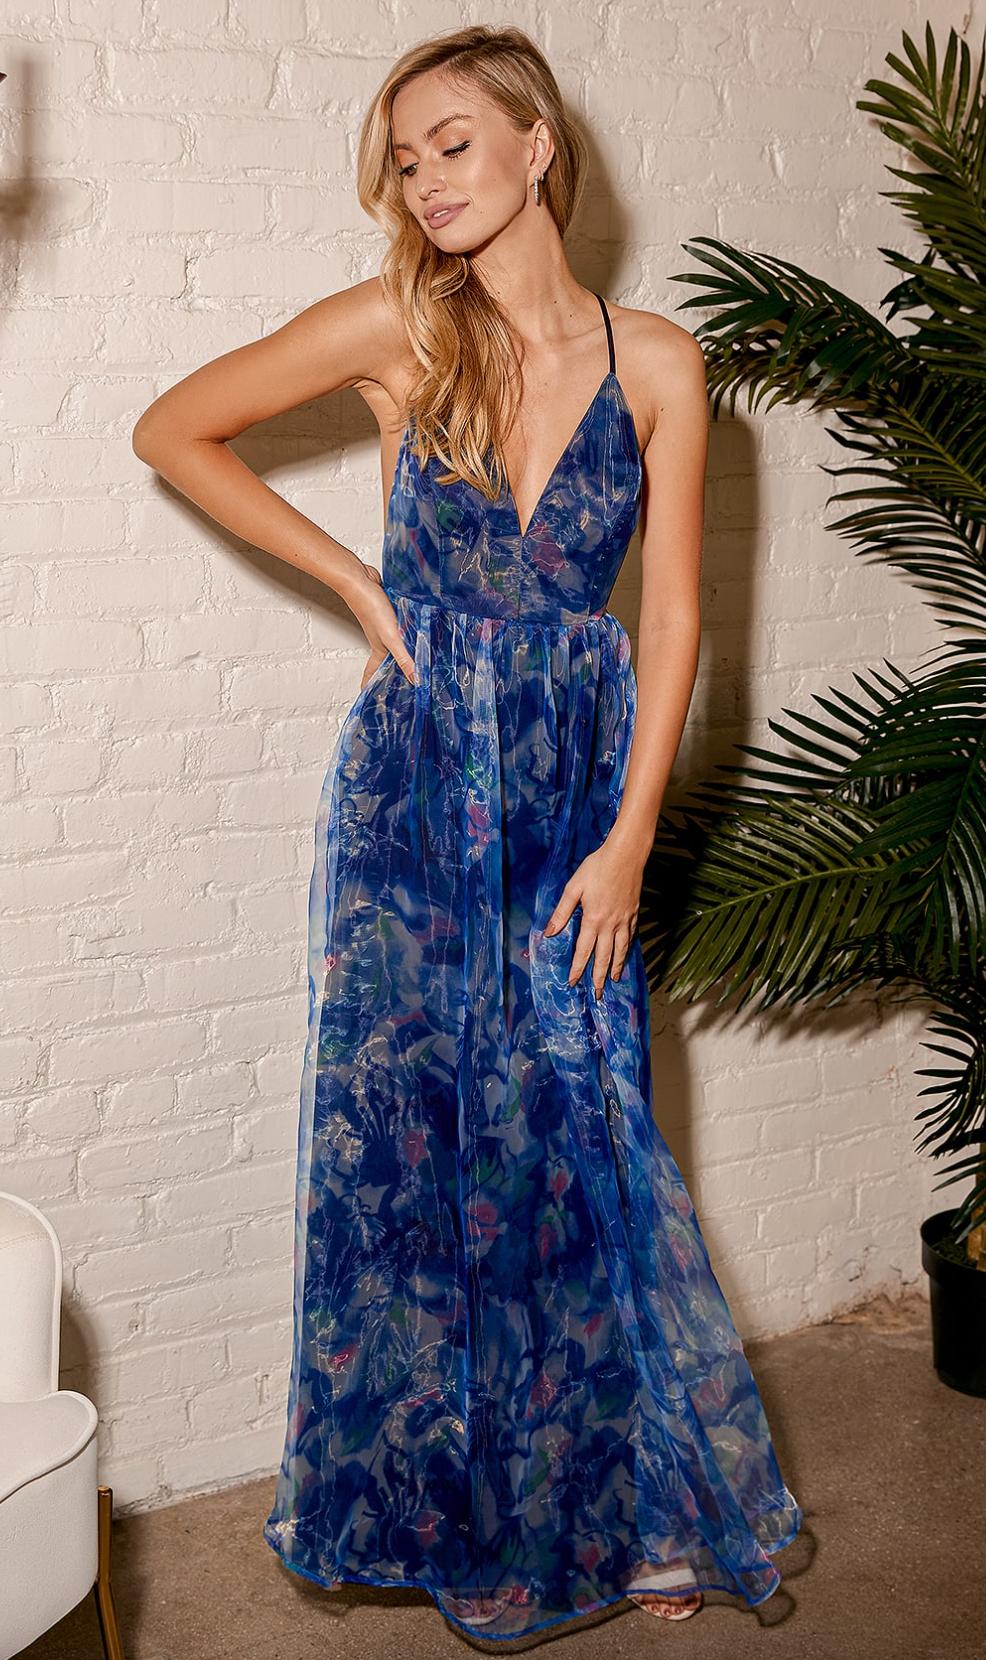 Navy blue maxi dress from Lulu's